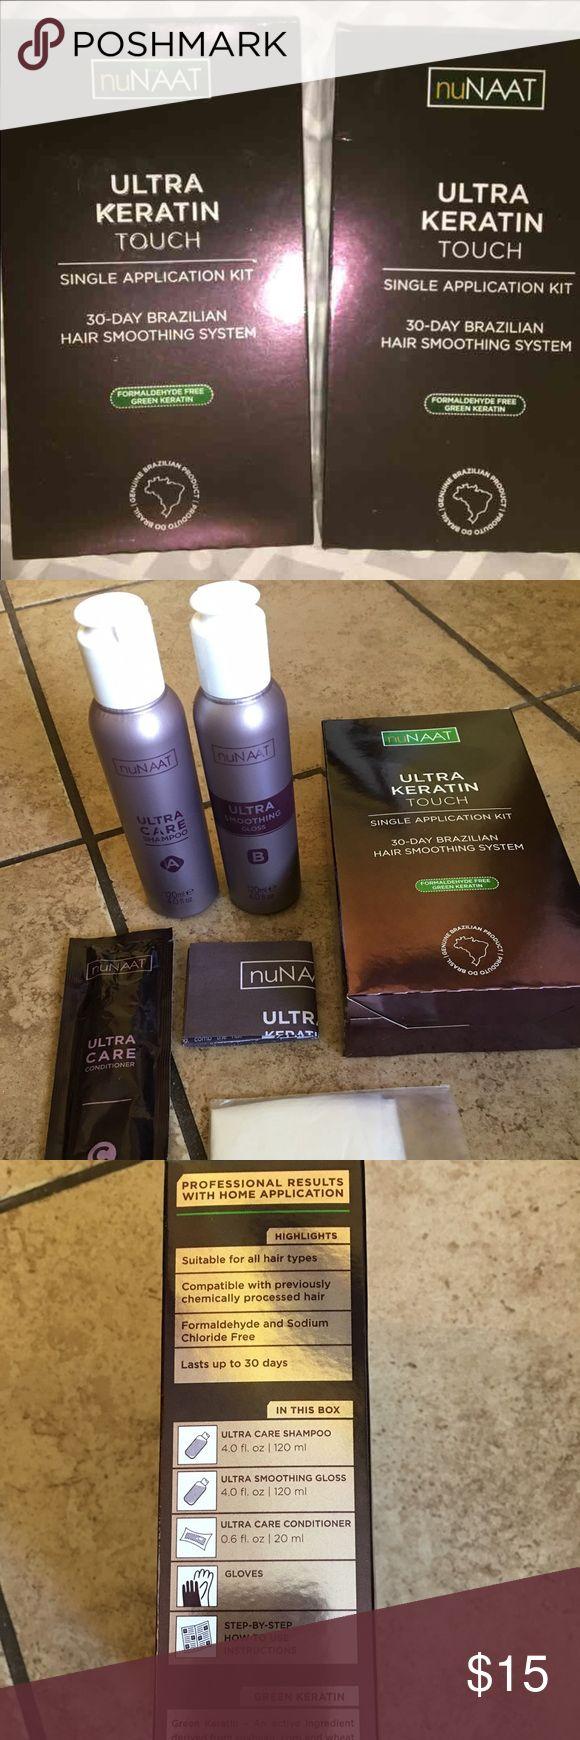 🌸2 keratin hair treatment kits 30 days Ships today bundle too Other